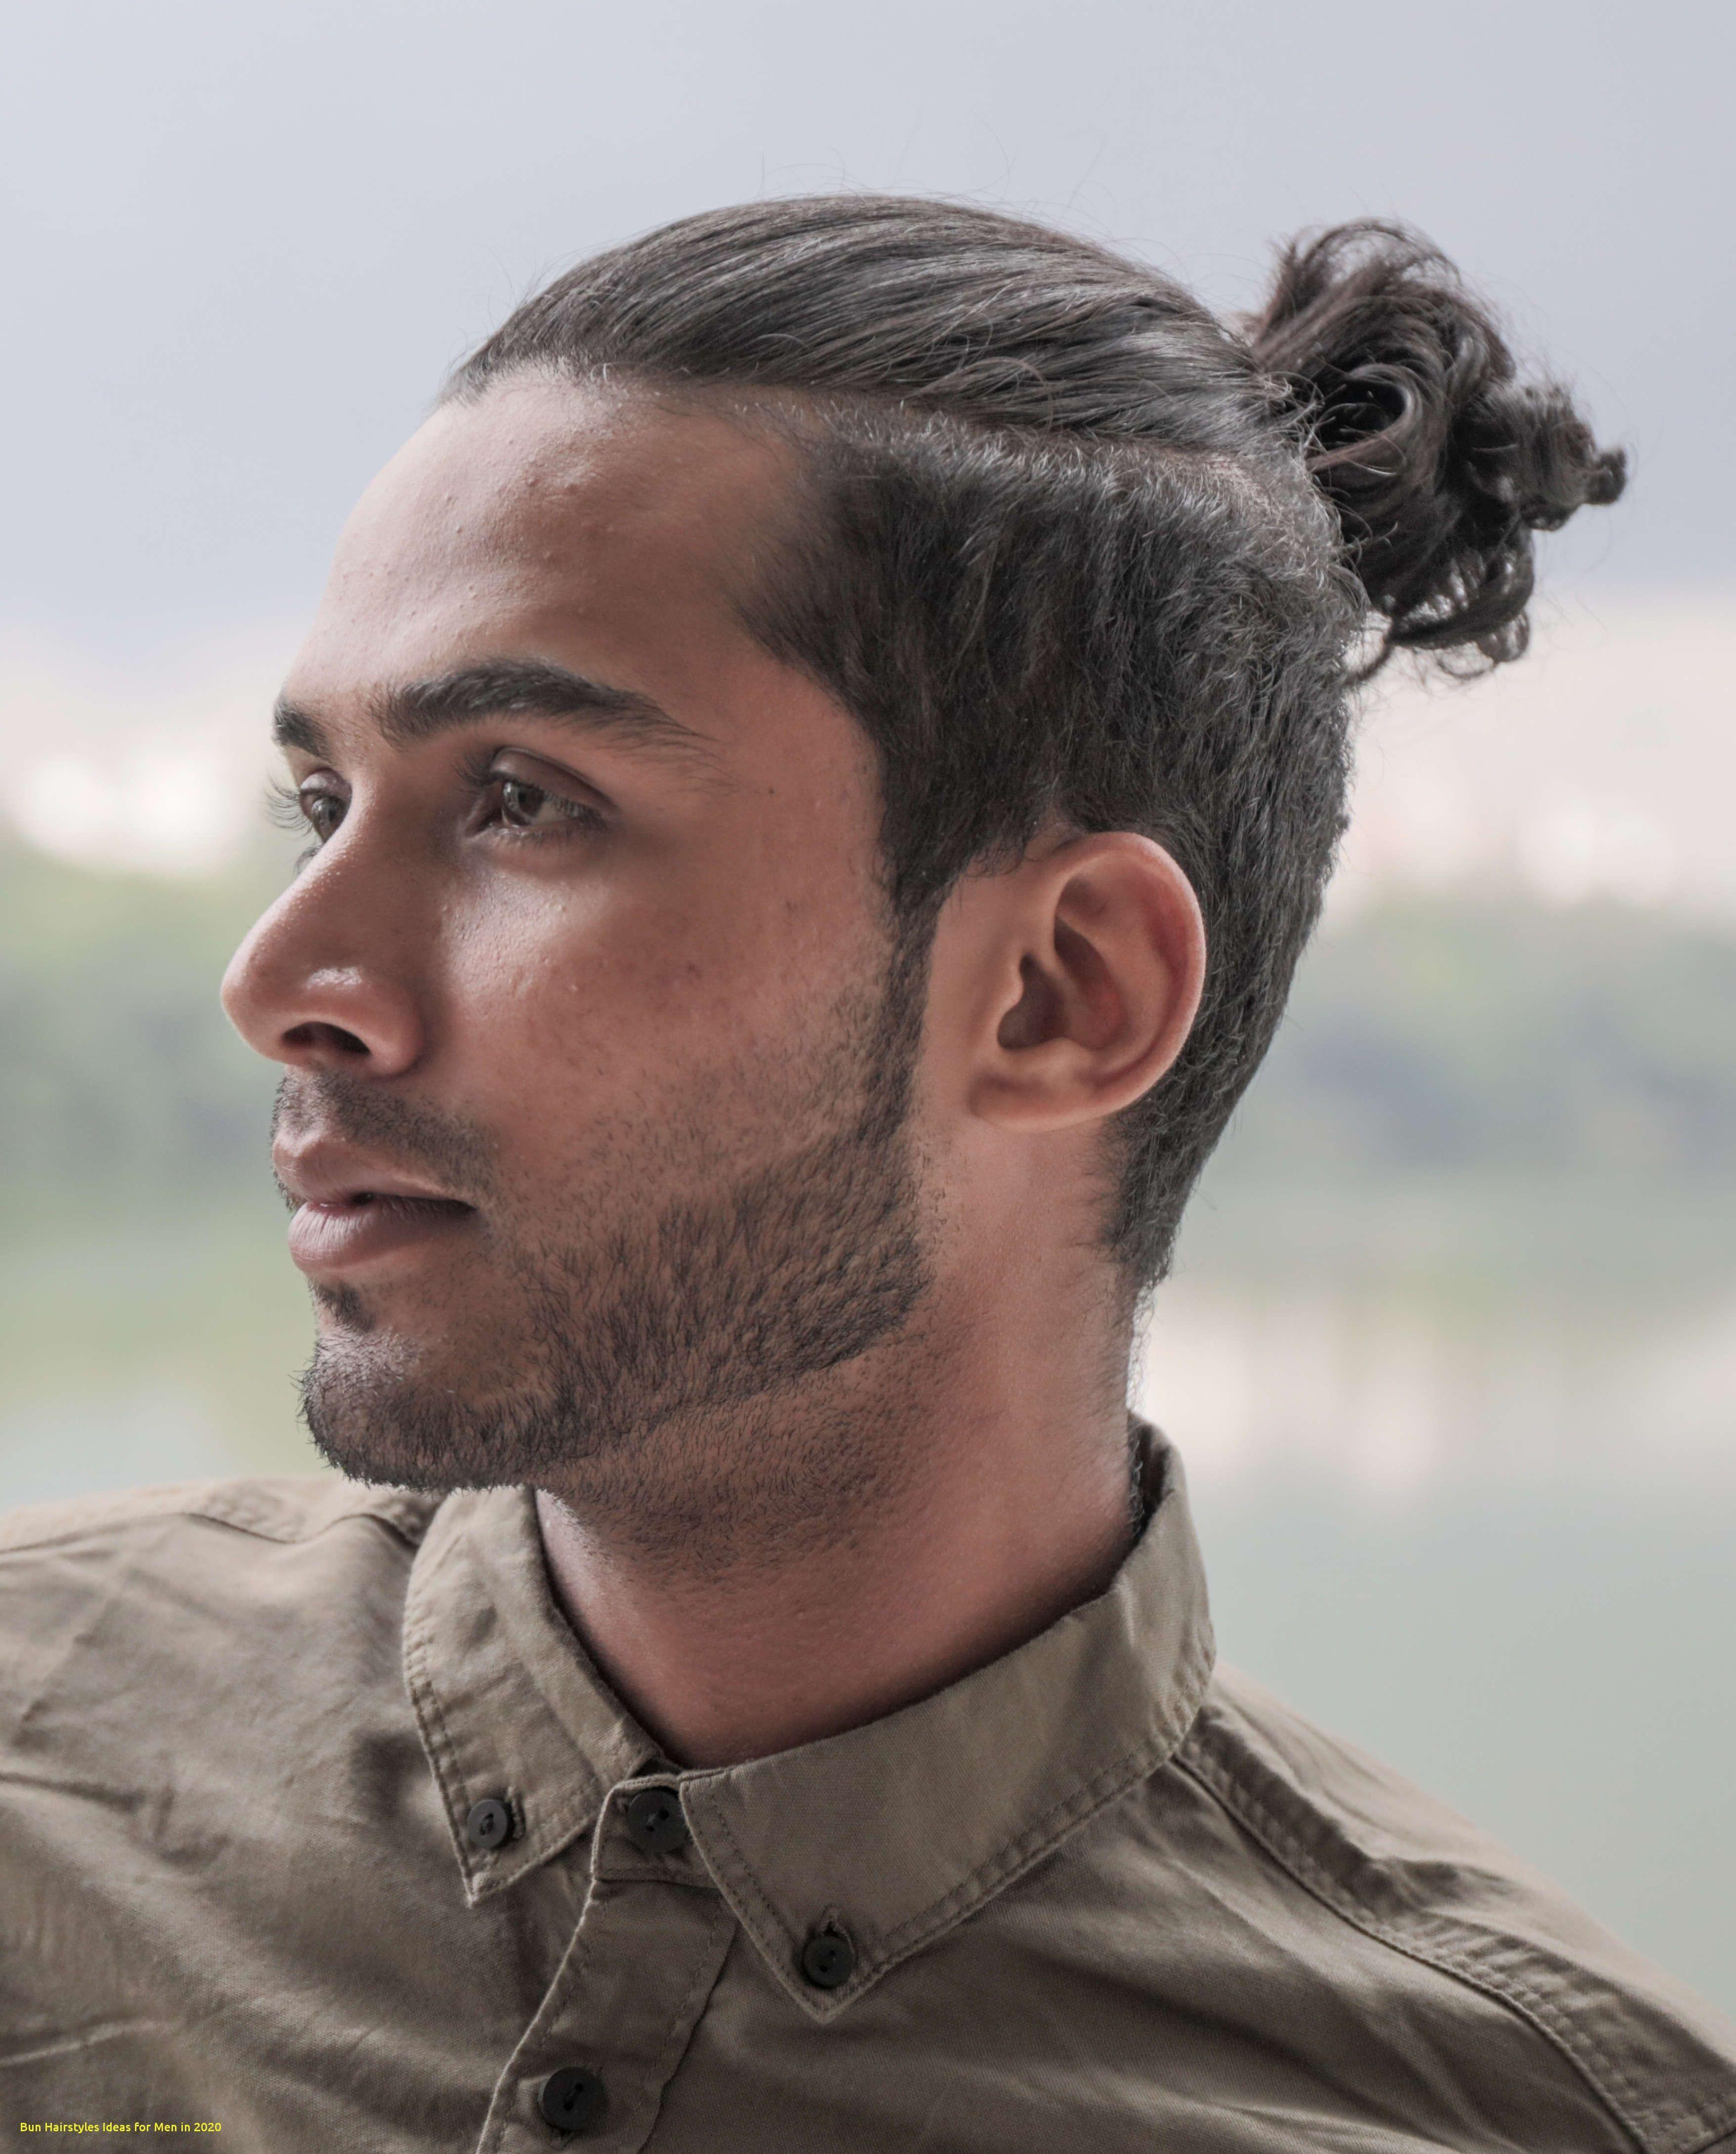 Hairstyle Ideas For Graduation Hairstyle Ideas Shoulder Length Short Hairstyle Ideas Uk Hairstyle Ideas With In 2020 Man Bun Hairstyles Man Ponytail Bun Hairstyles